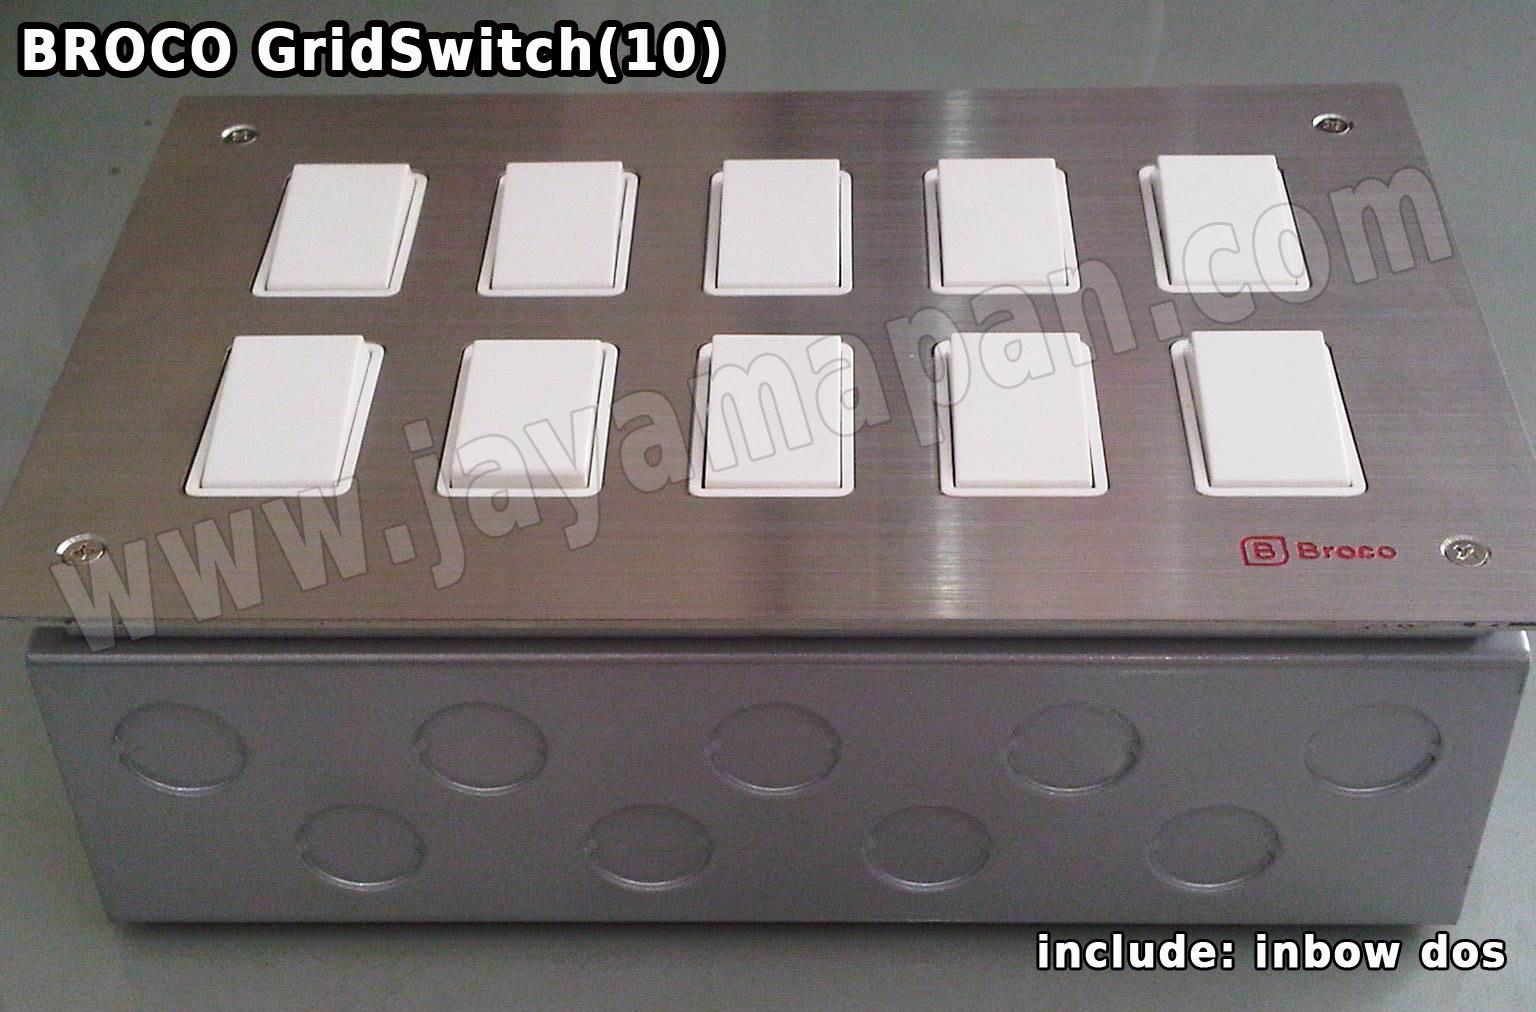 Broco Gridswitch